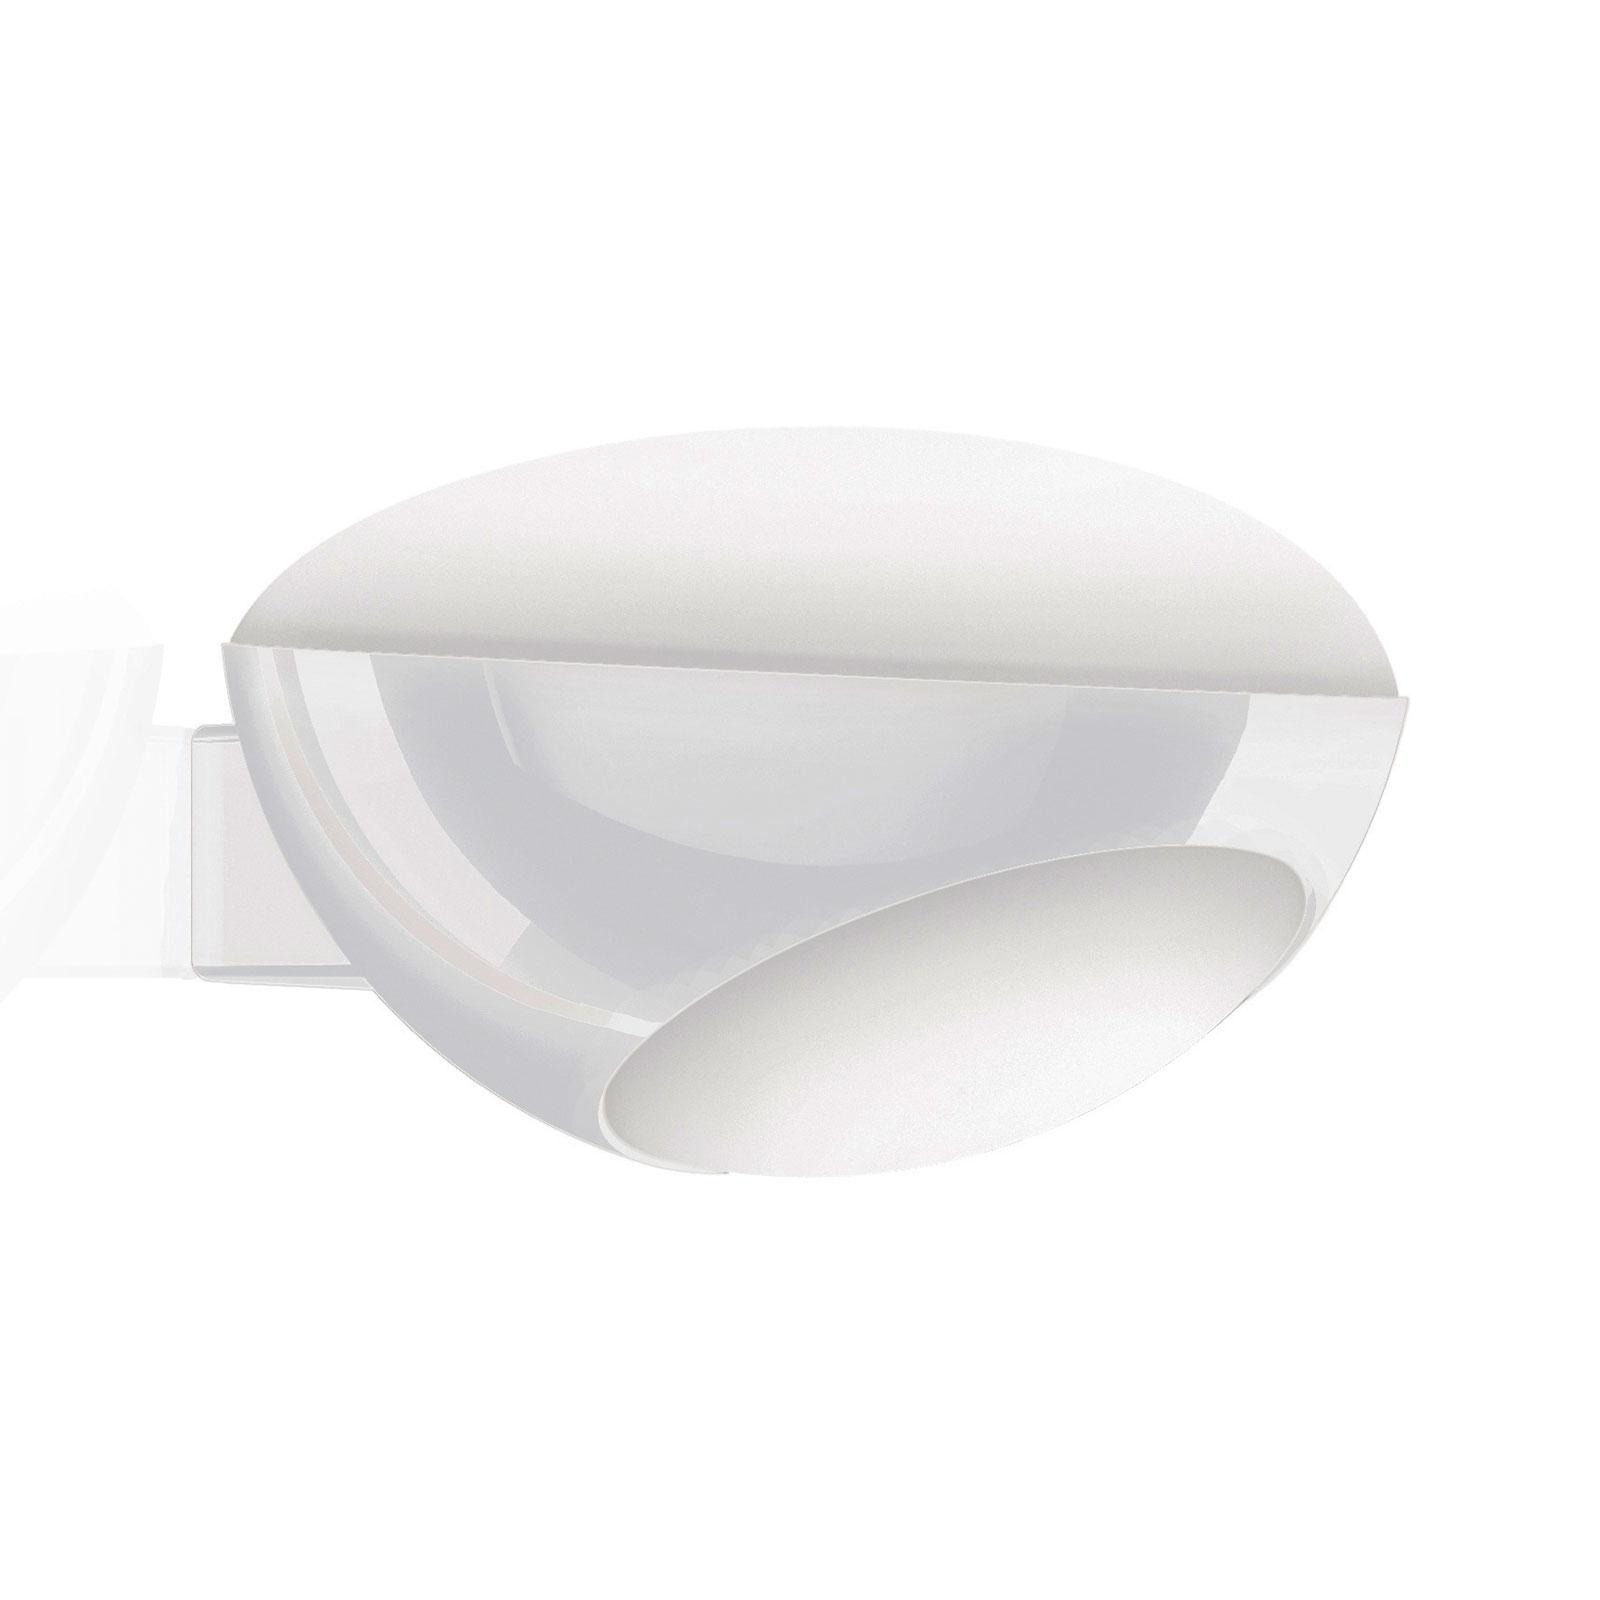 Kundalini Tua kinkiet LED, biały